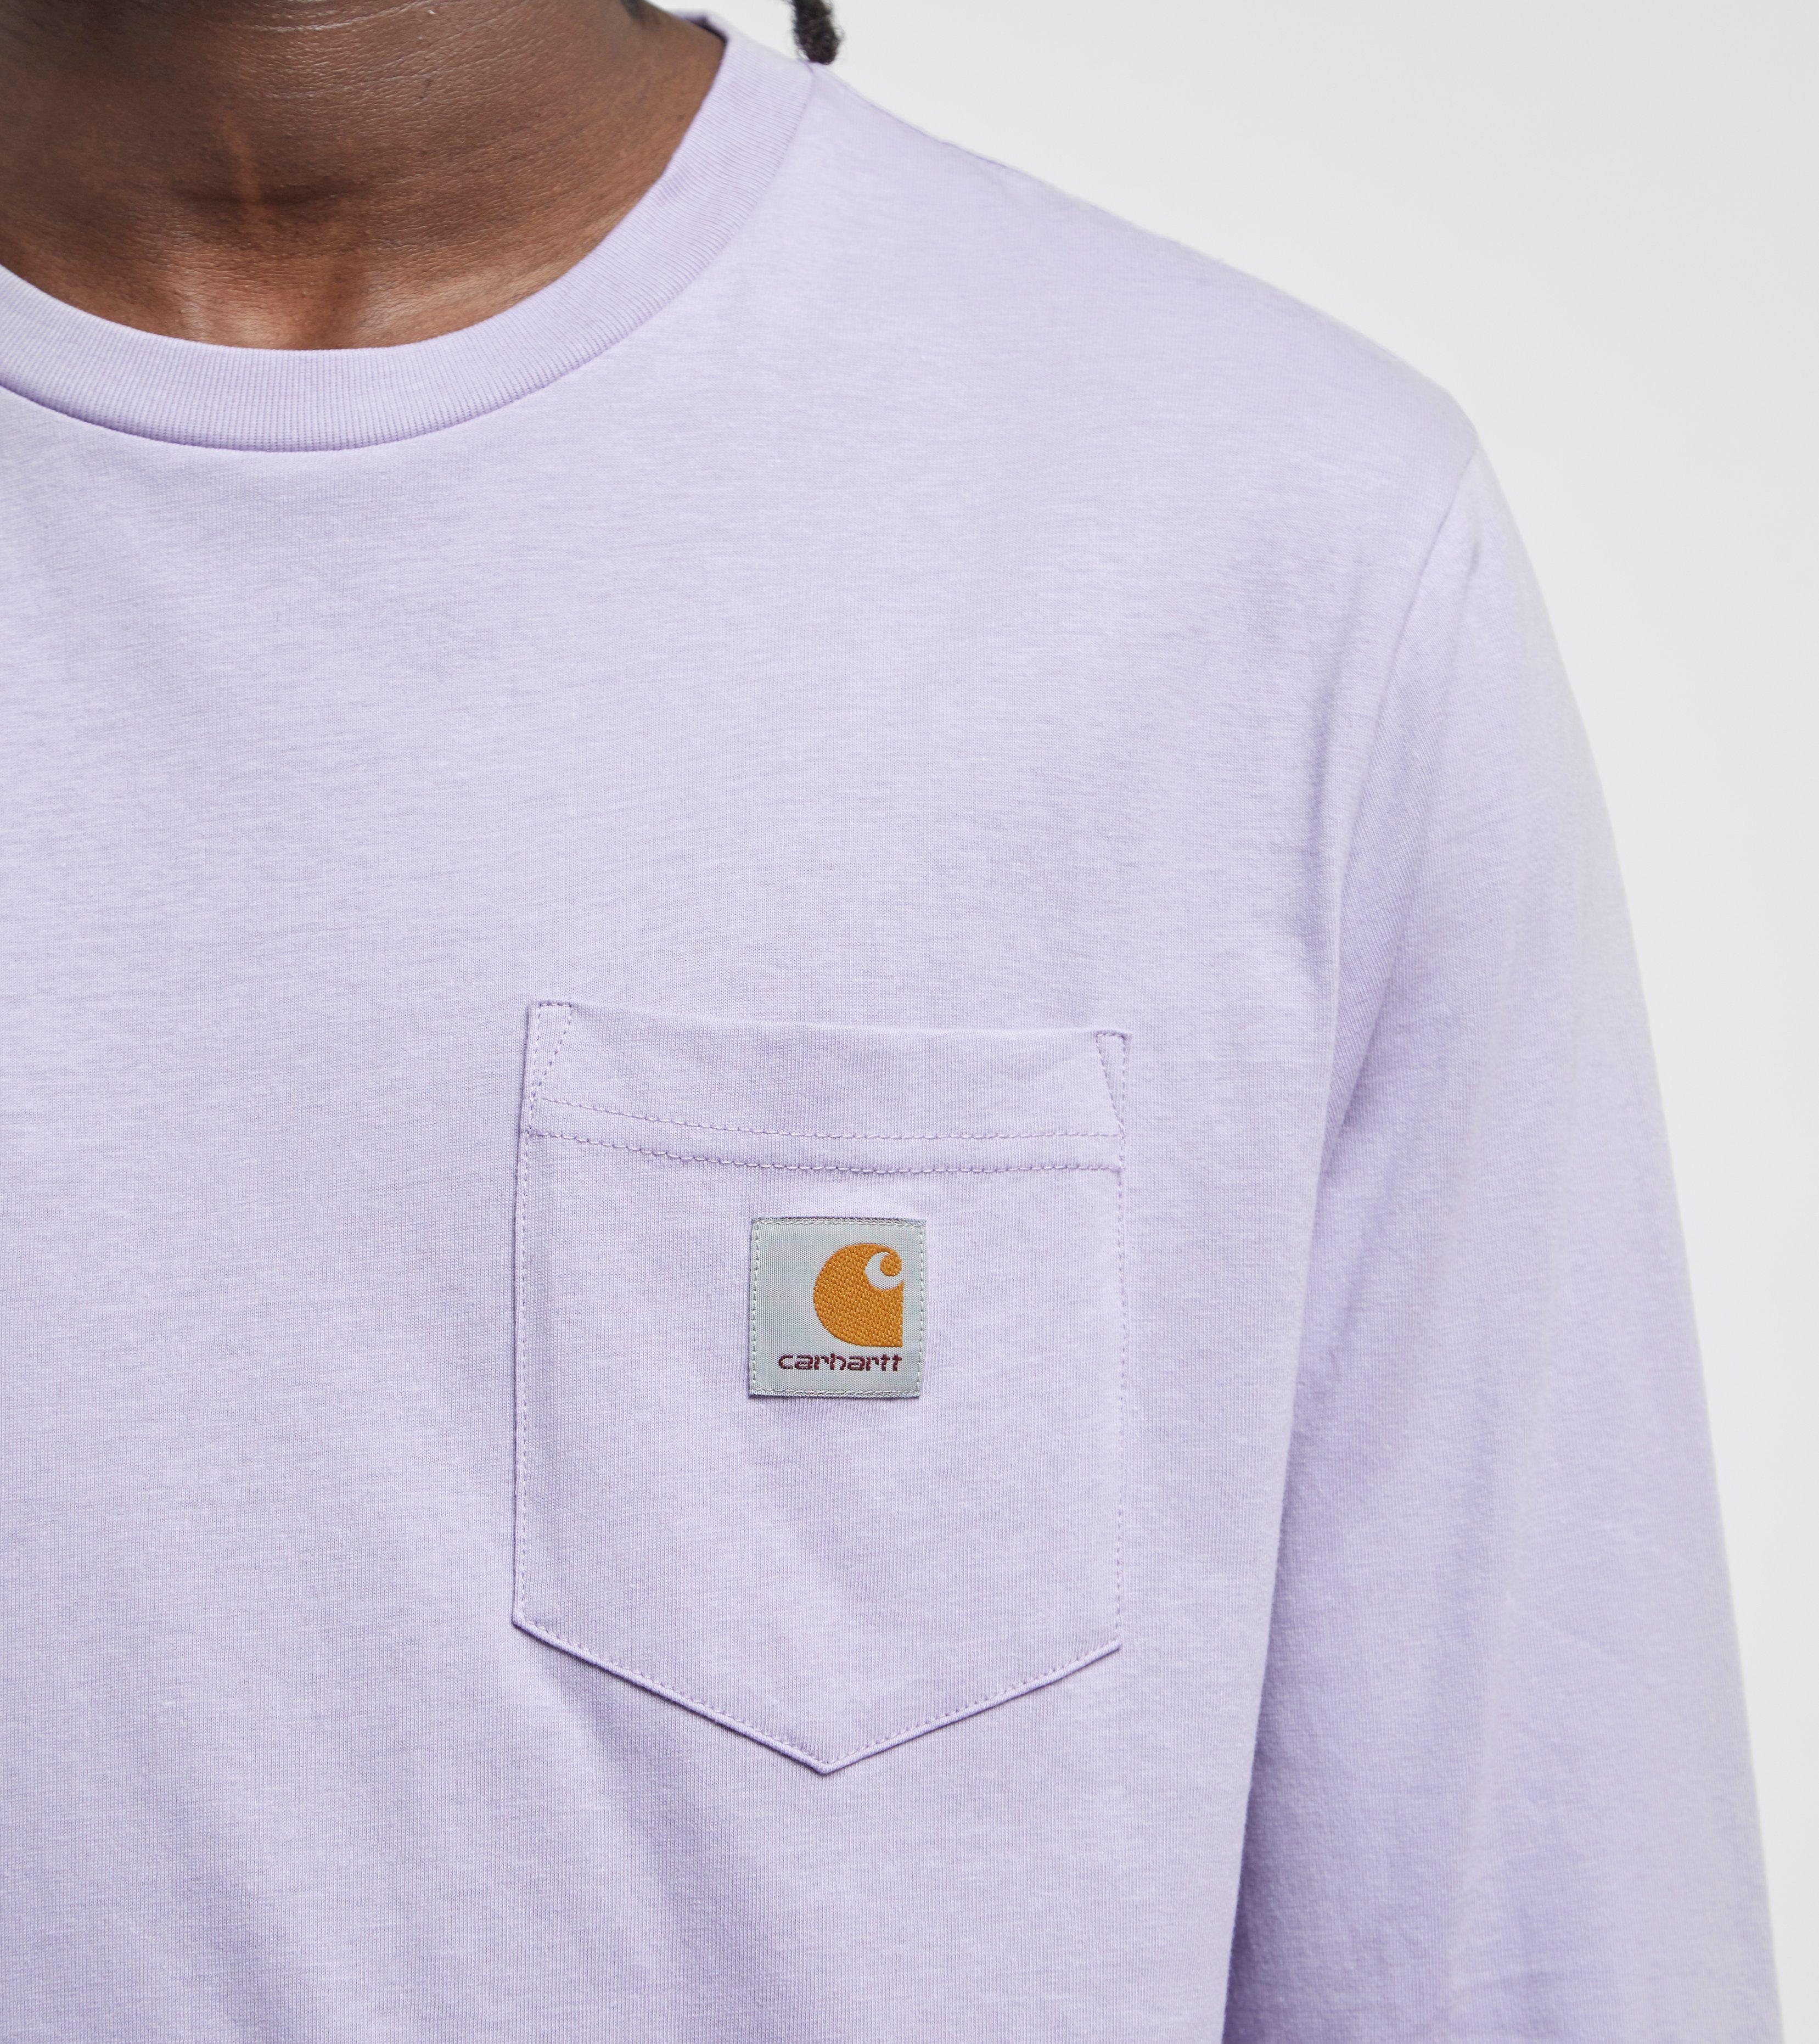 Carhartt WIP Long Sleeve Pocket T-Shirt